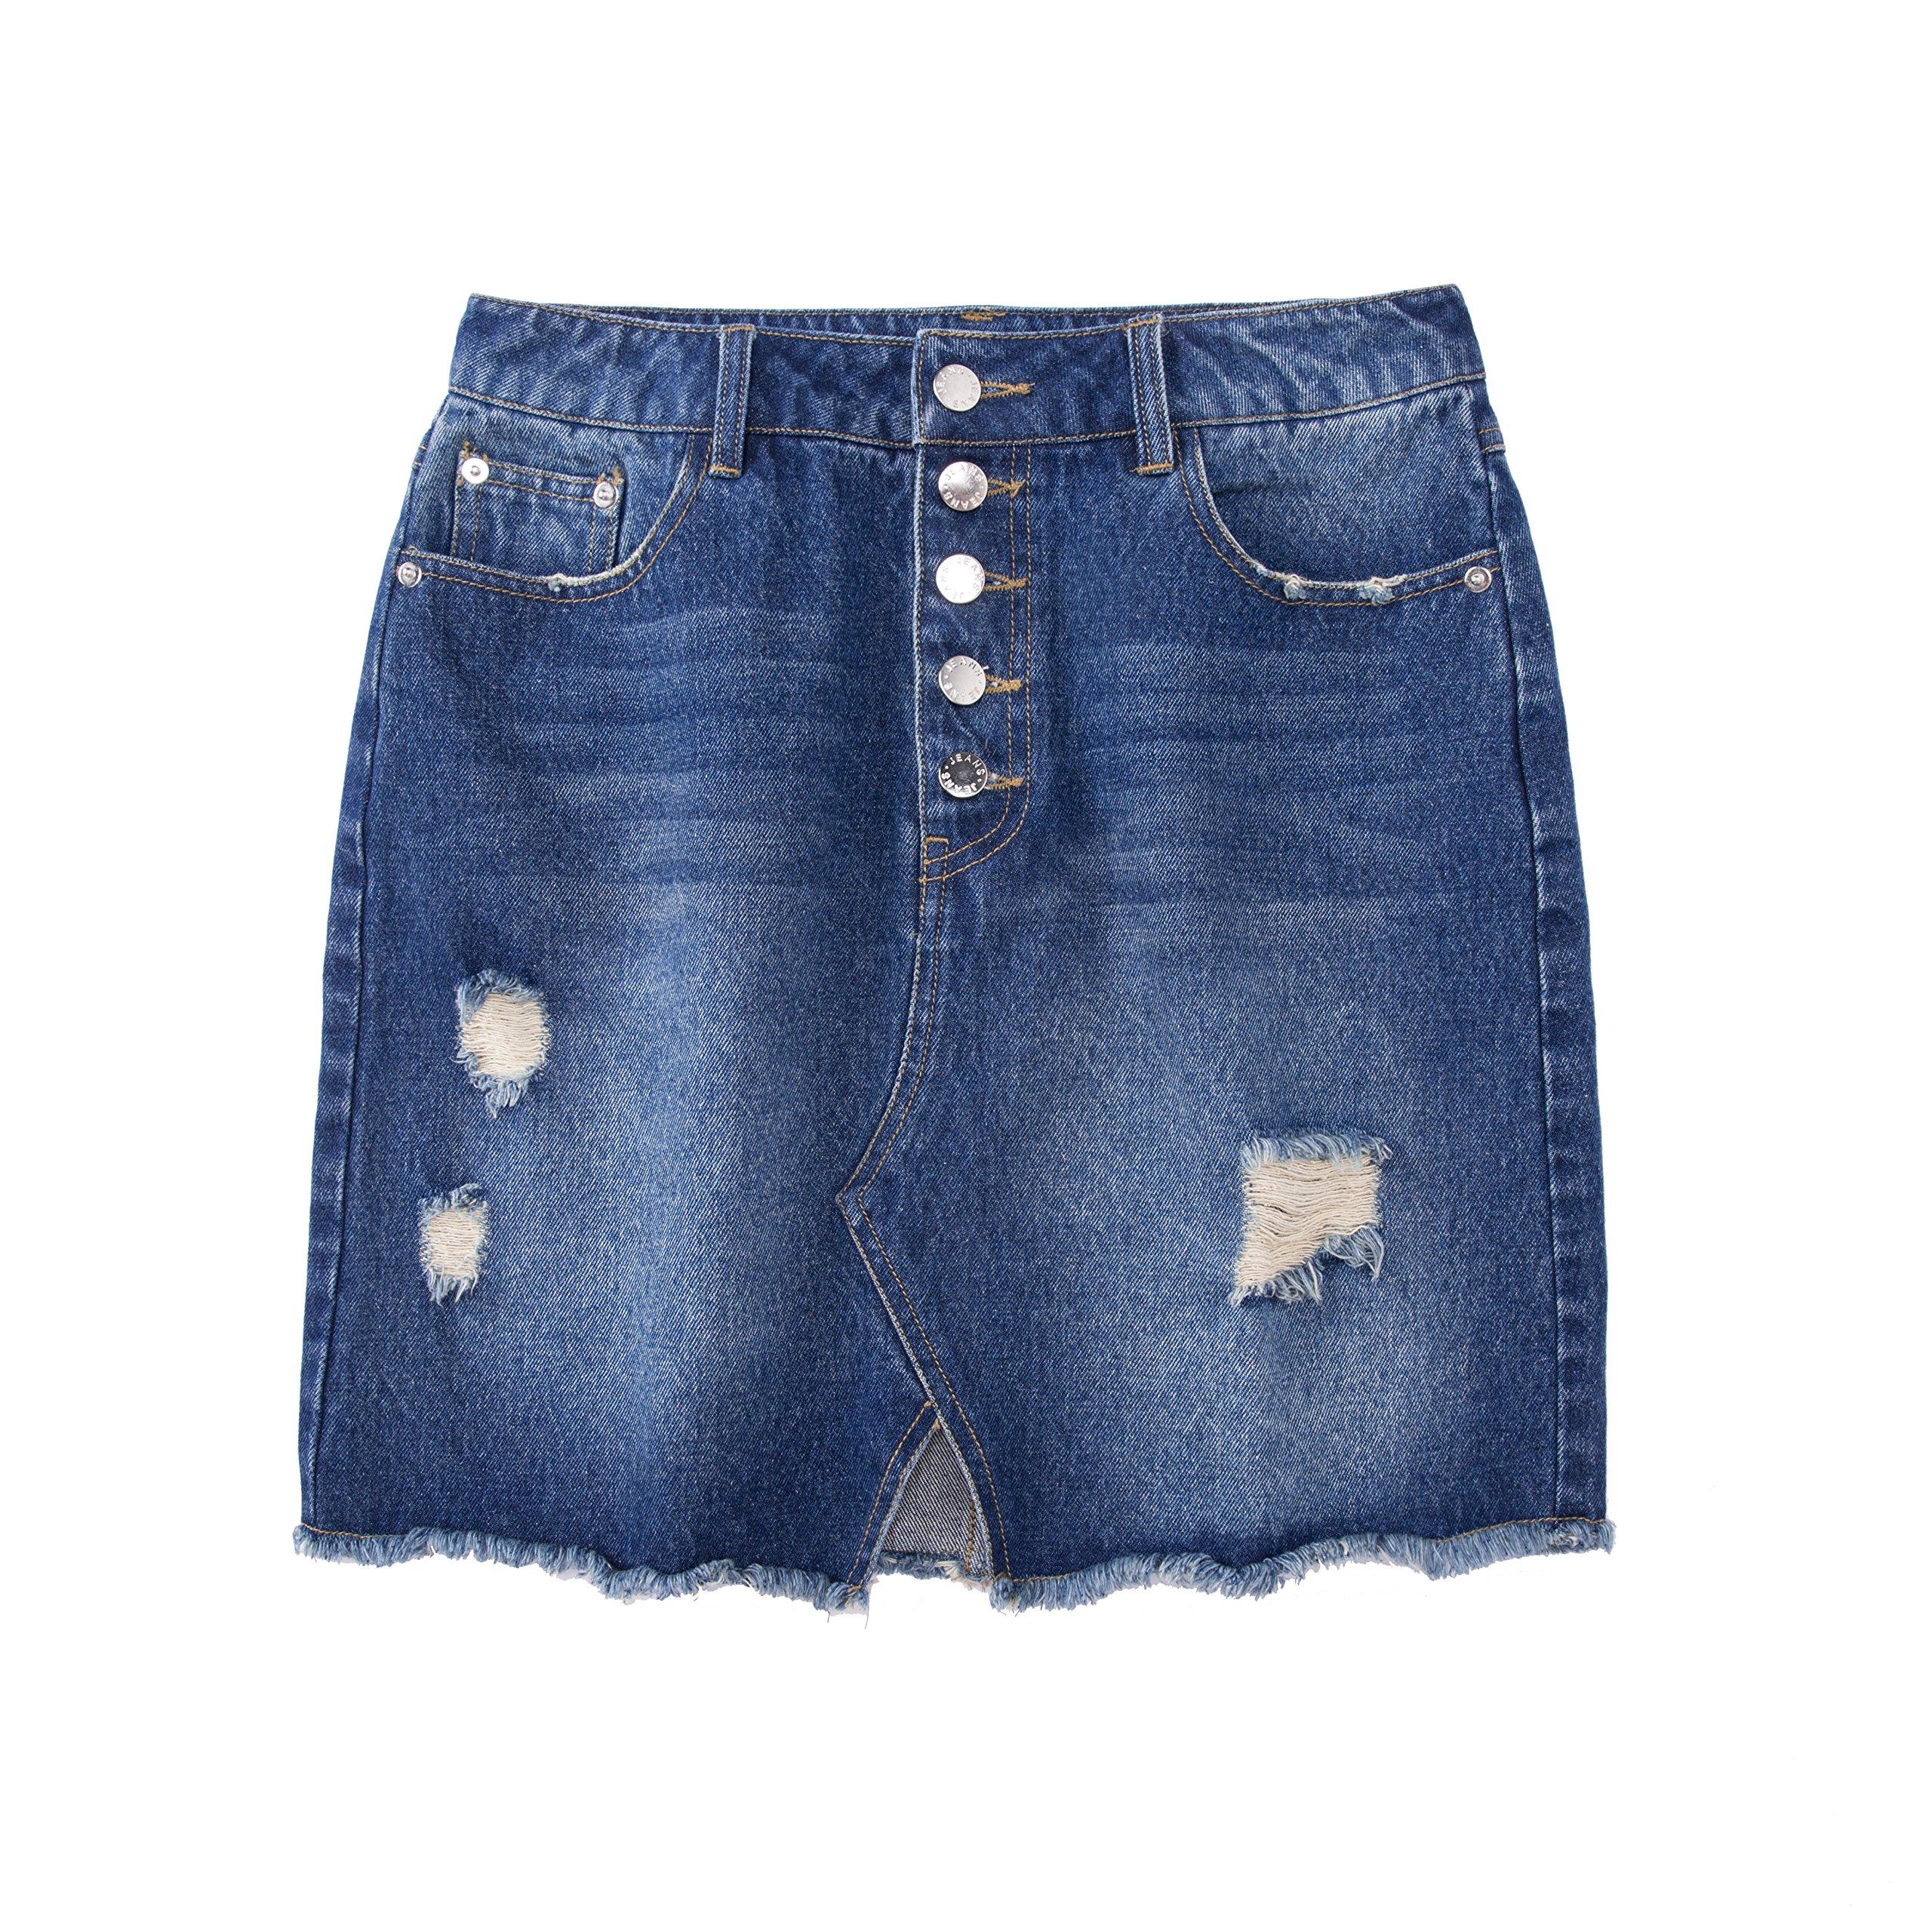 "Tronjori Womens Distressed Ripped Denim Short Pencil Skirt, Frayed Hem(S,Blue Waist 28"")"